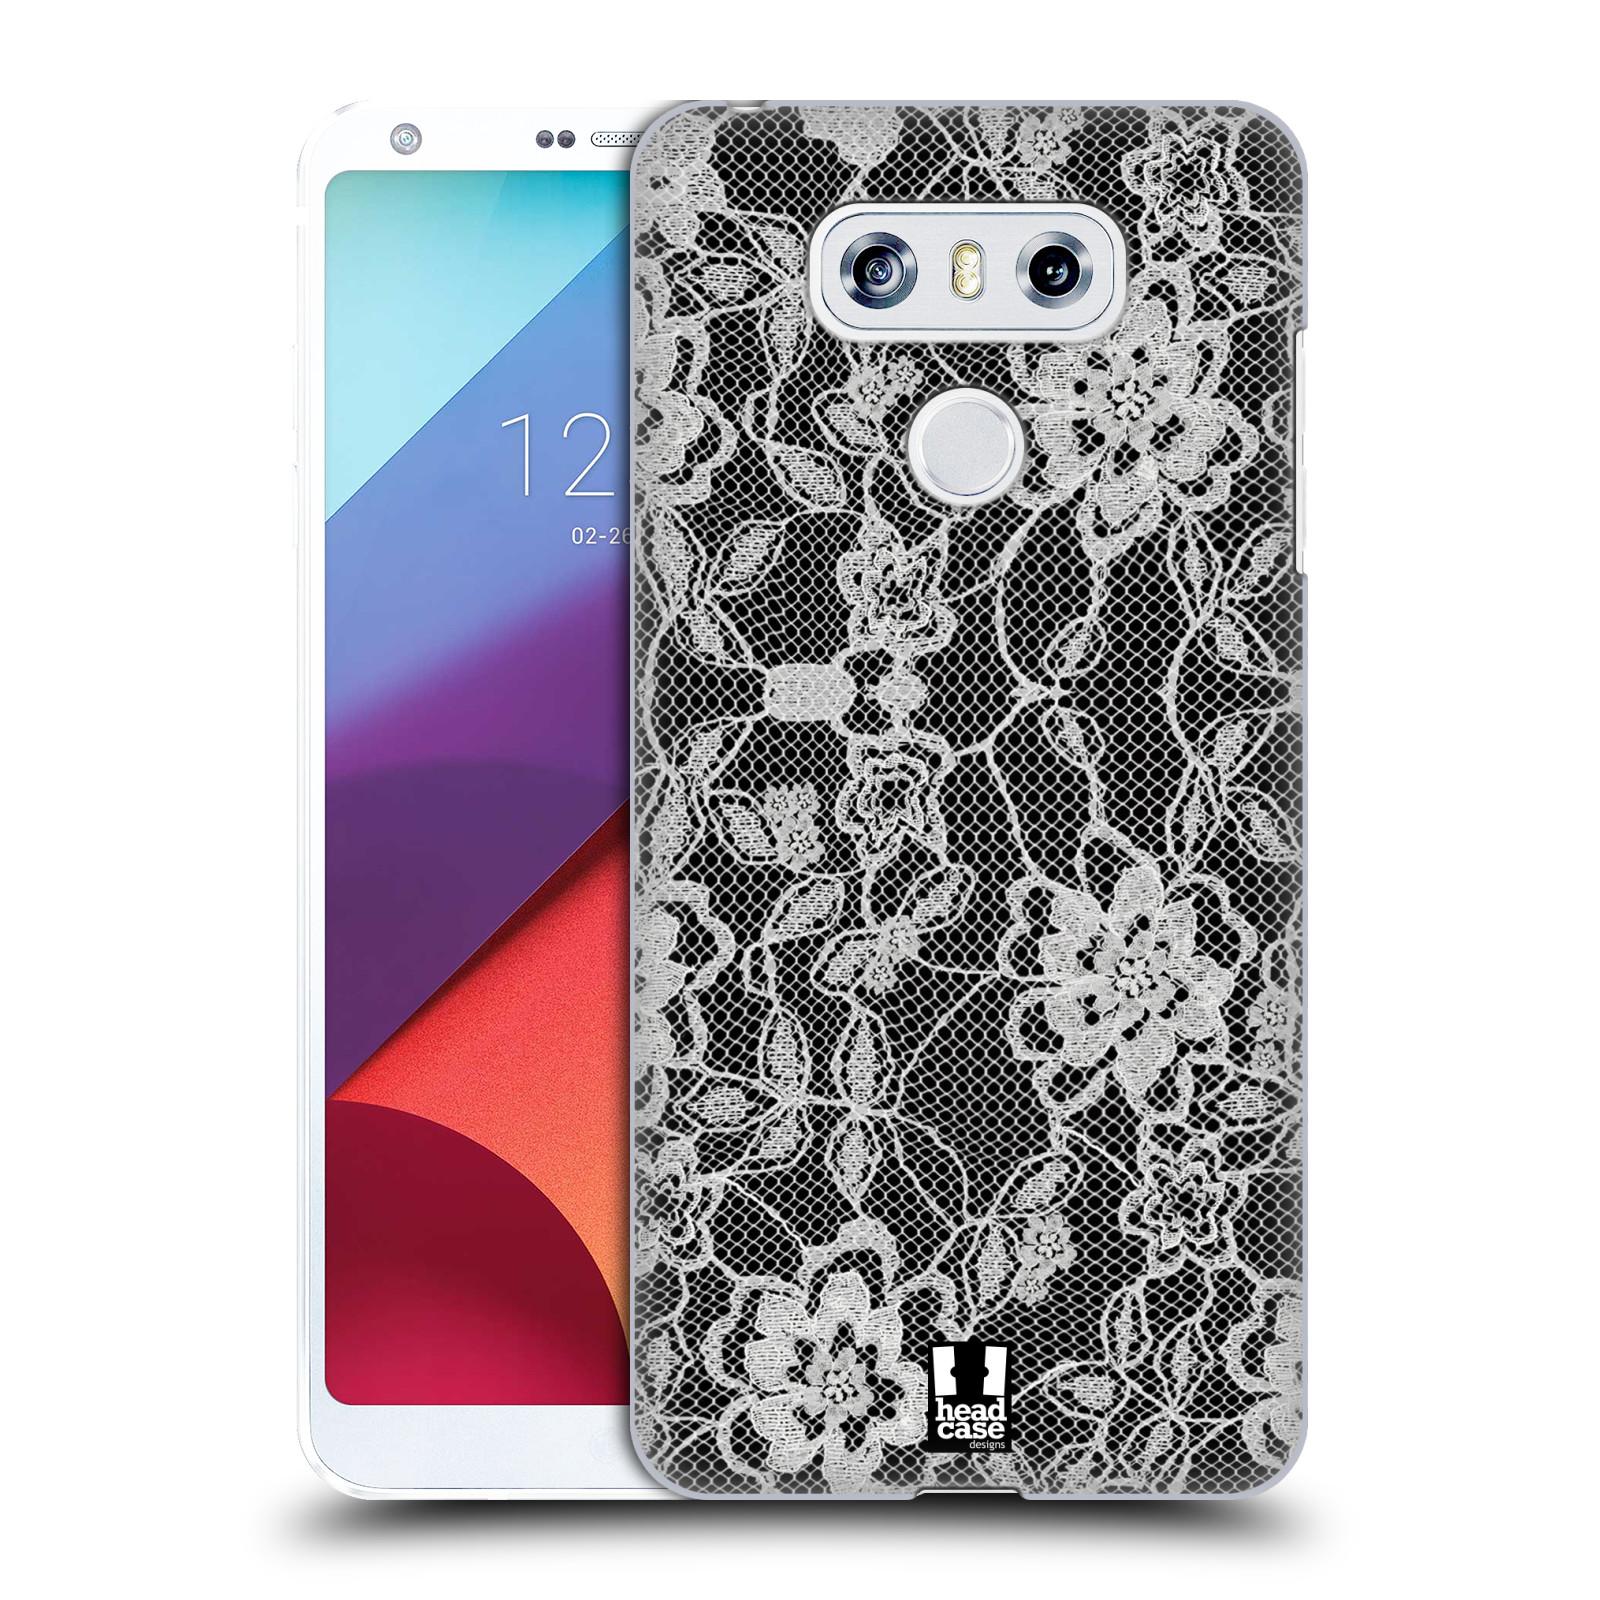 Plastové pouzdro na mobil LG G6 - Head Case FLOWERY KRAJKA